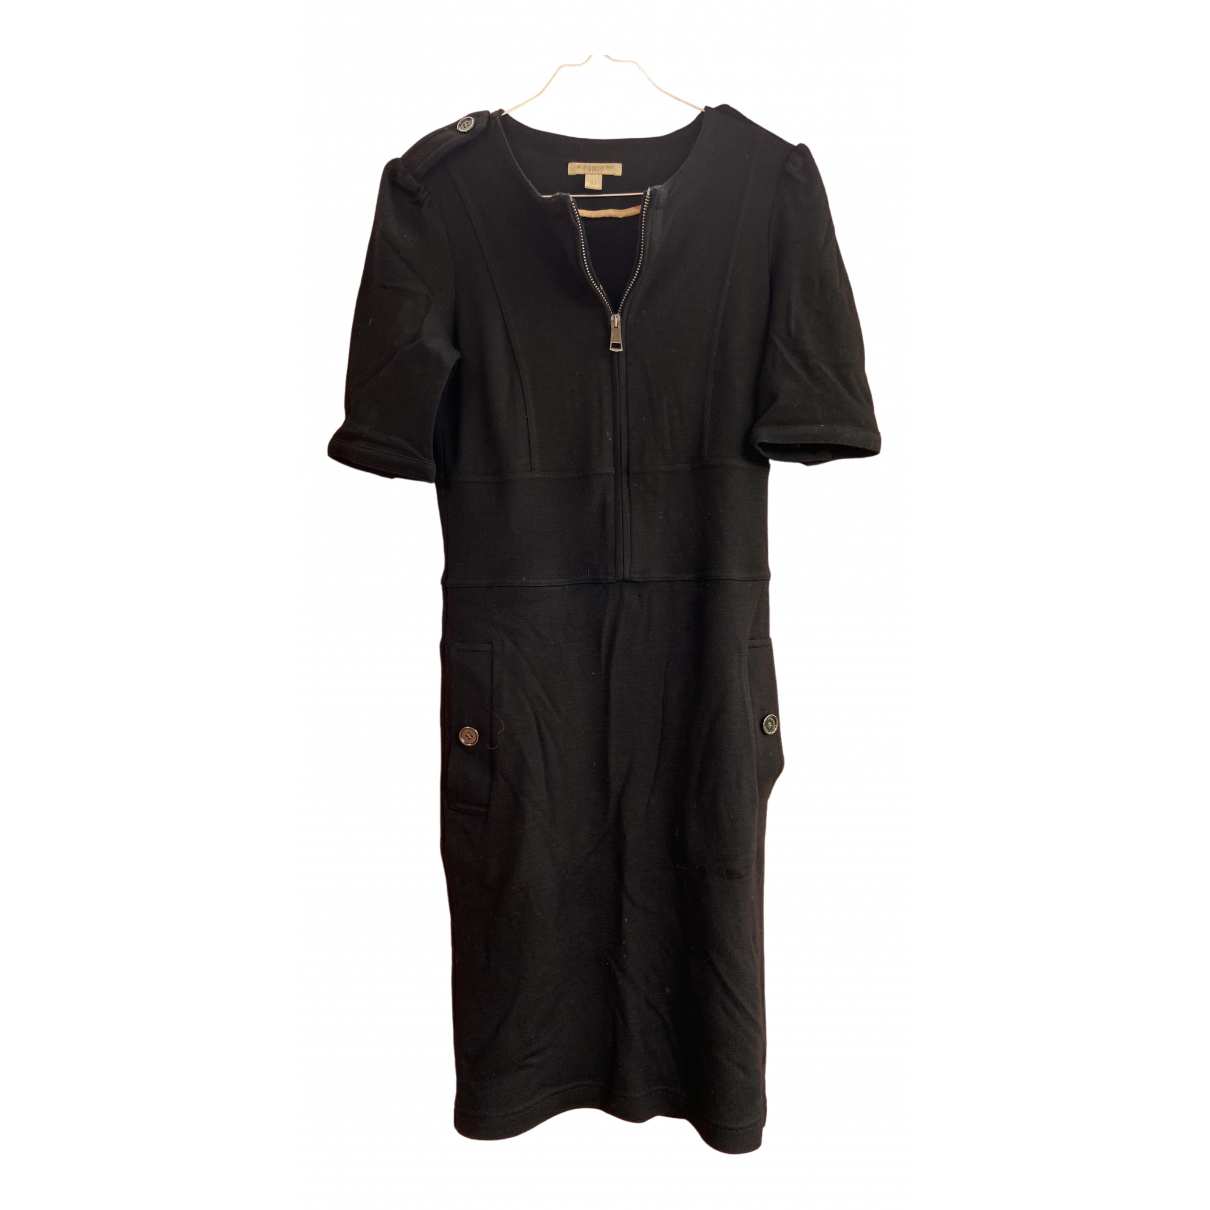 Burberry \N Kleid in  Schwarz Wolle